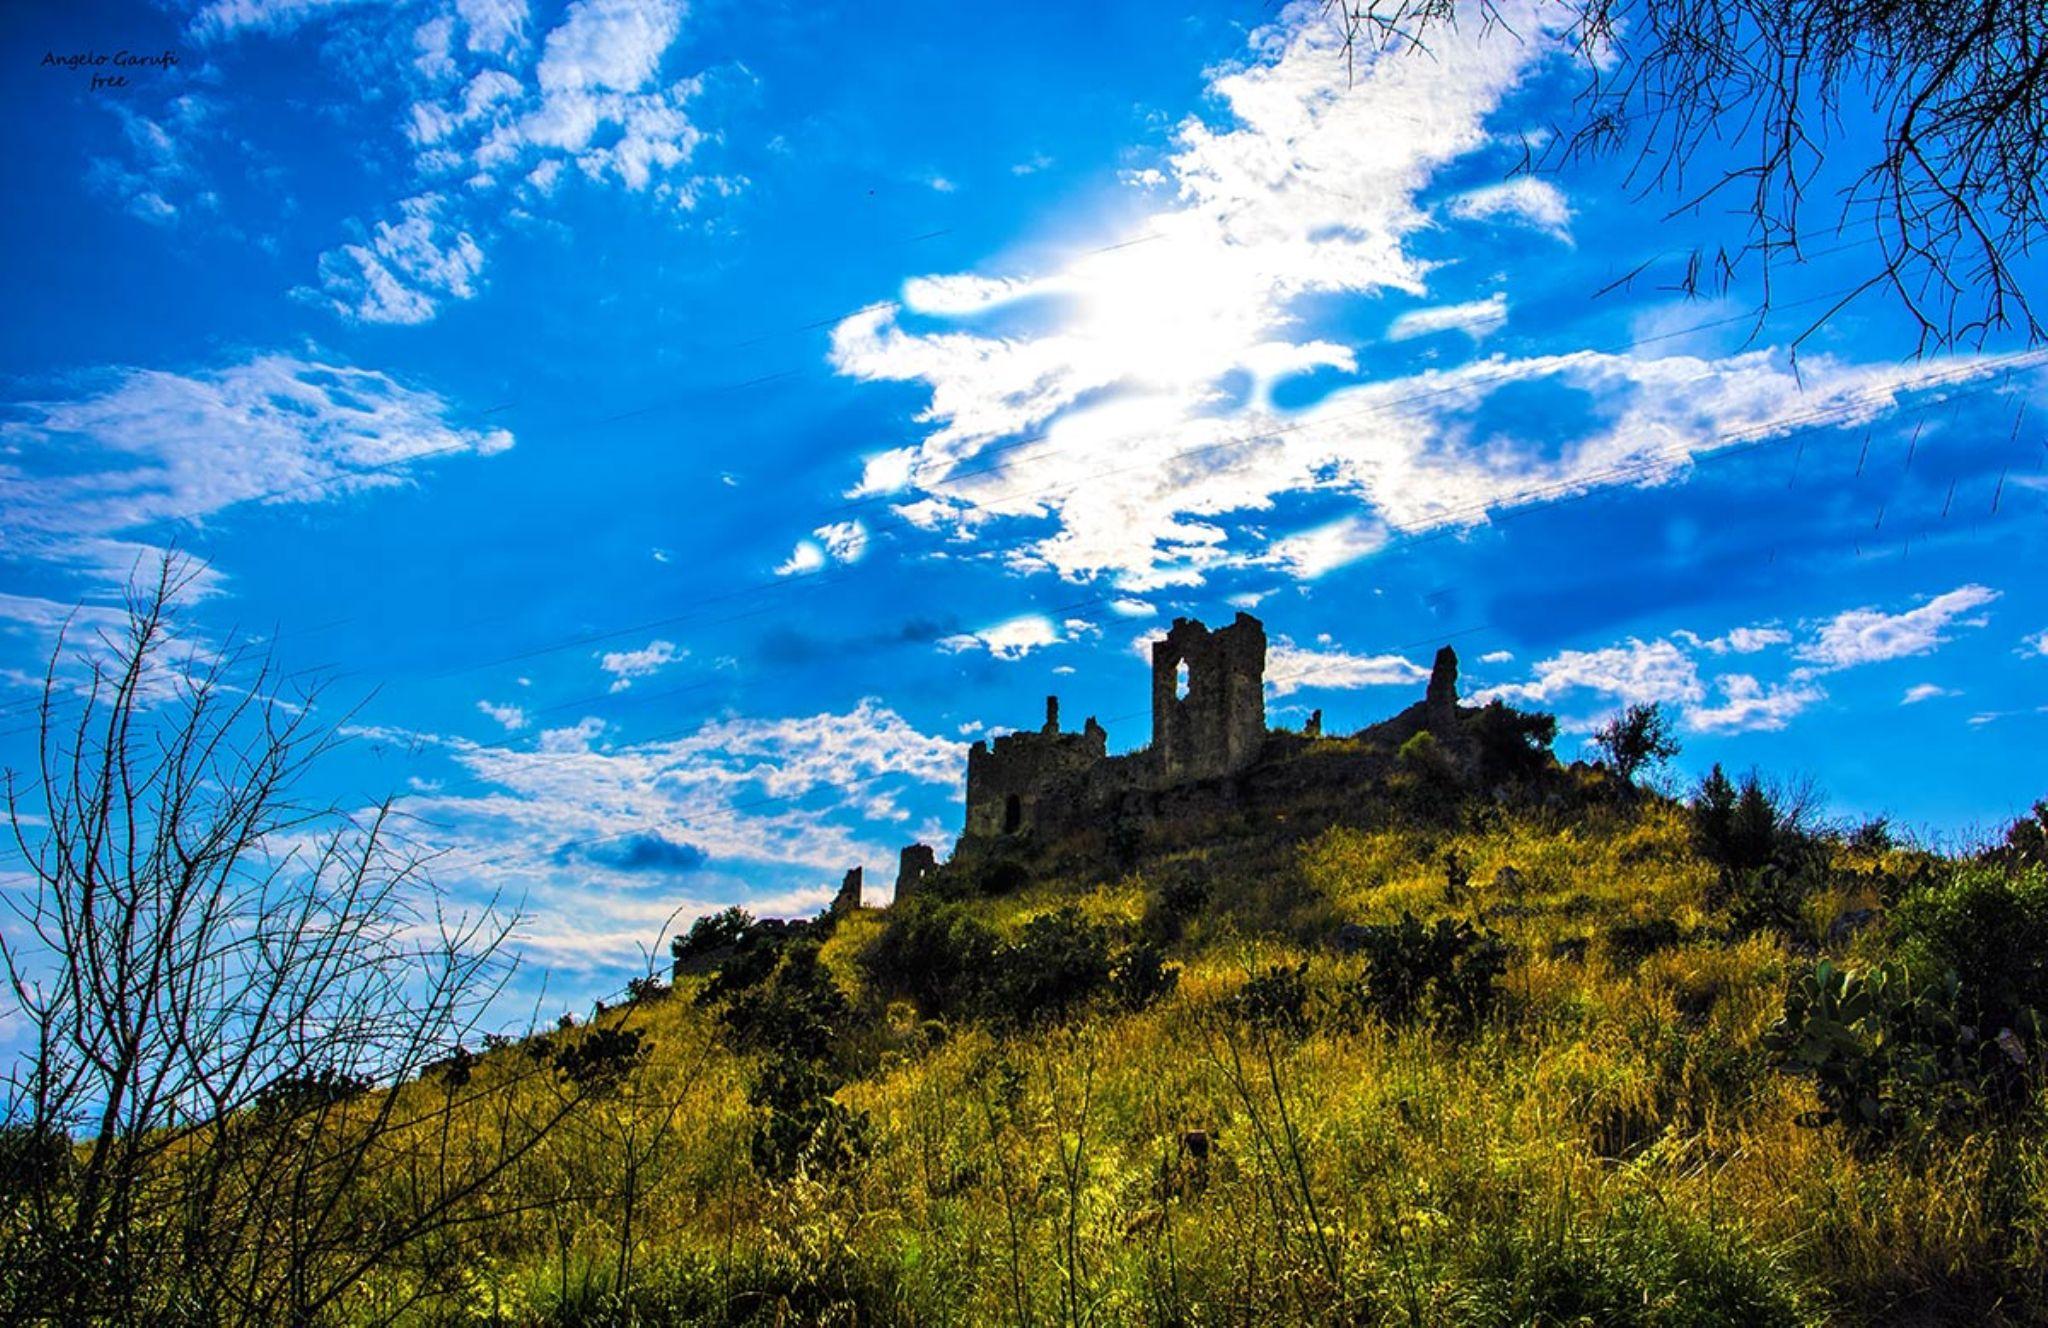 Ruin by Garufi Angelo